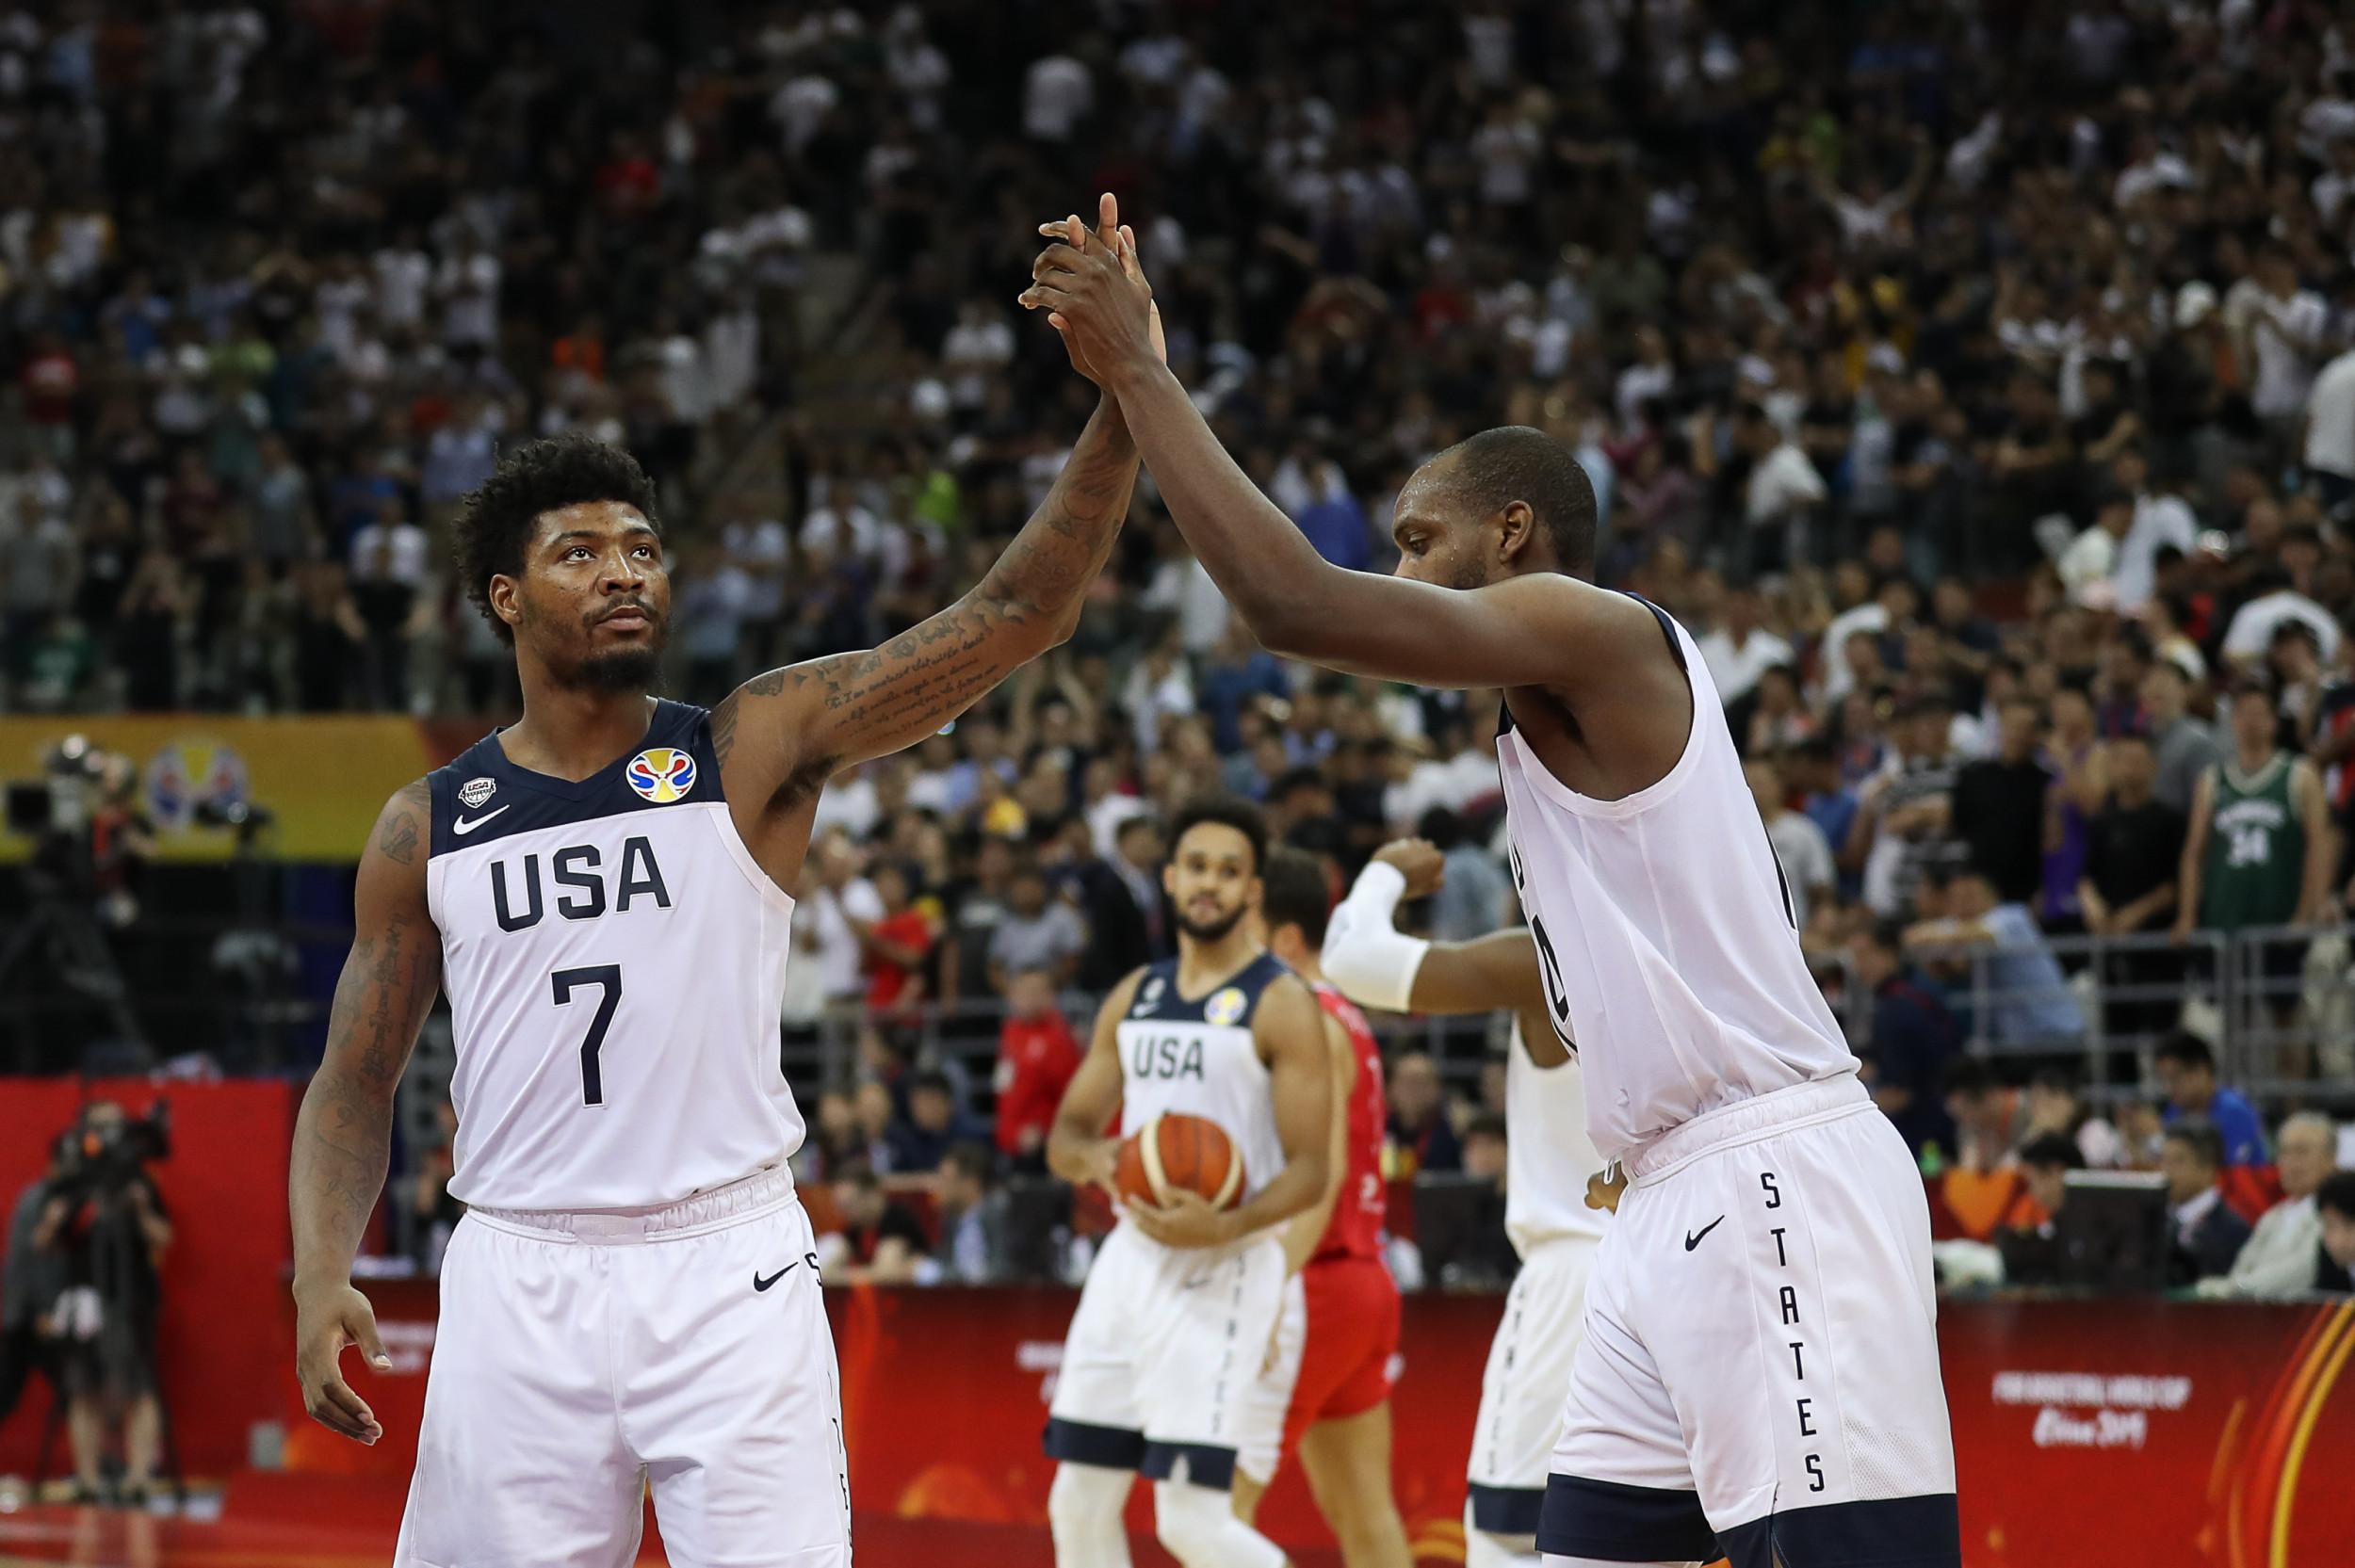 FIBA Basketball World Cup 2019: Where to Watch Team USA vs